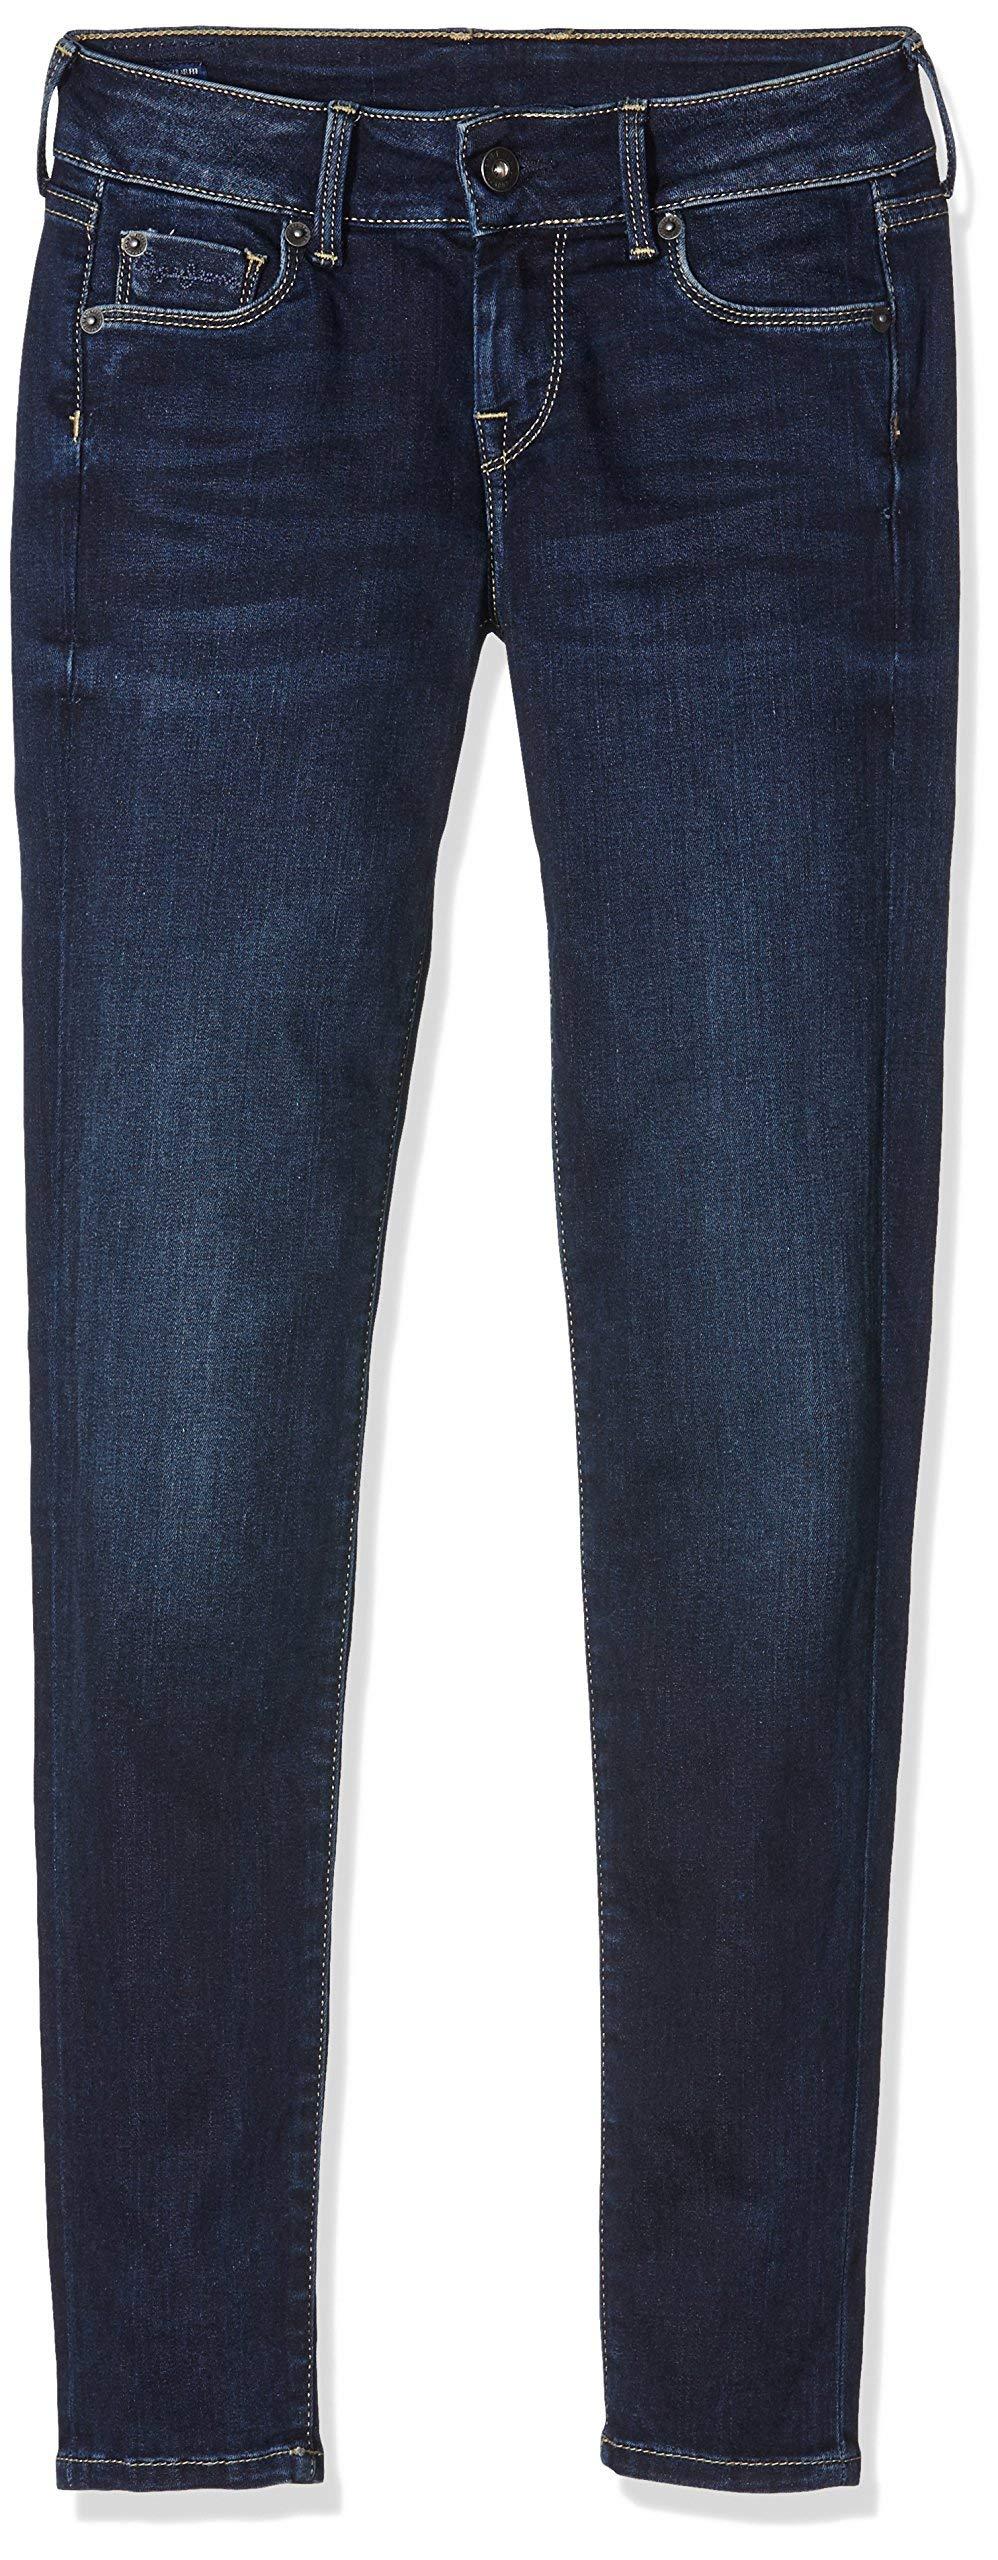 JeanDenim10oz Pepe Dark Soho Worn31w30l Femme Jeans Used Fc3u51TlKJ